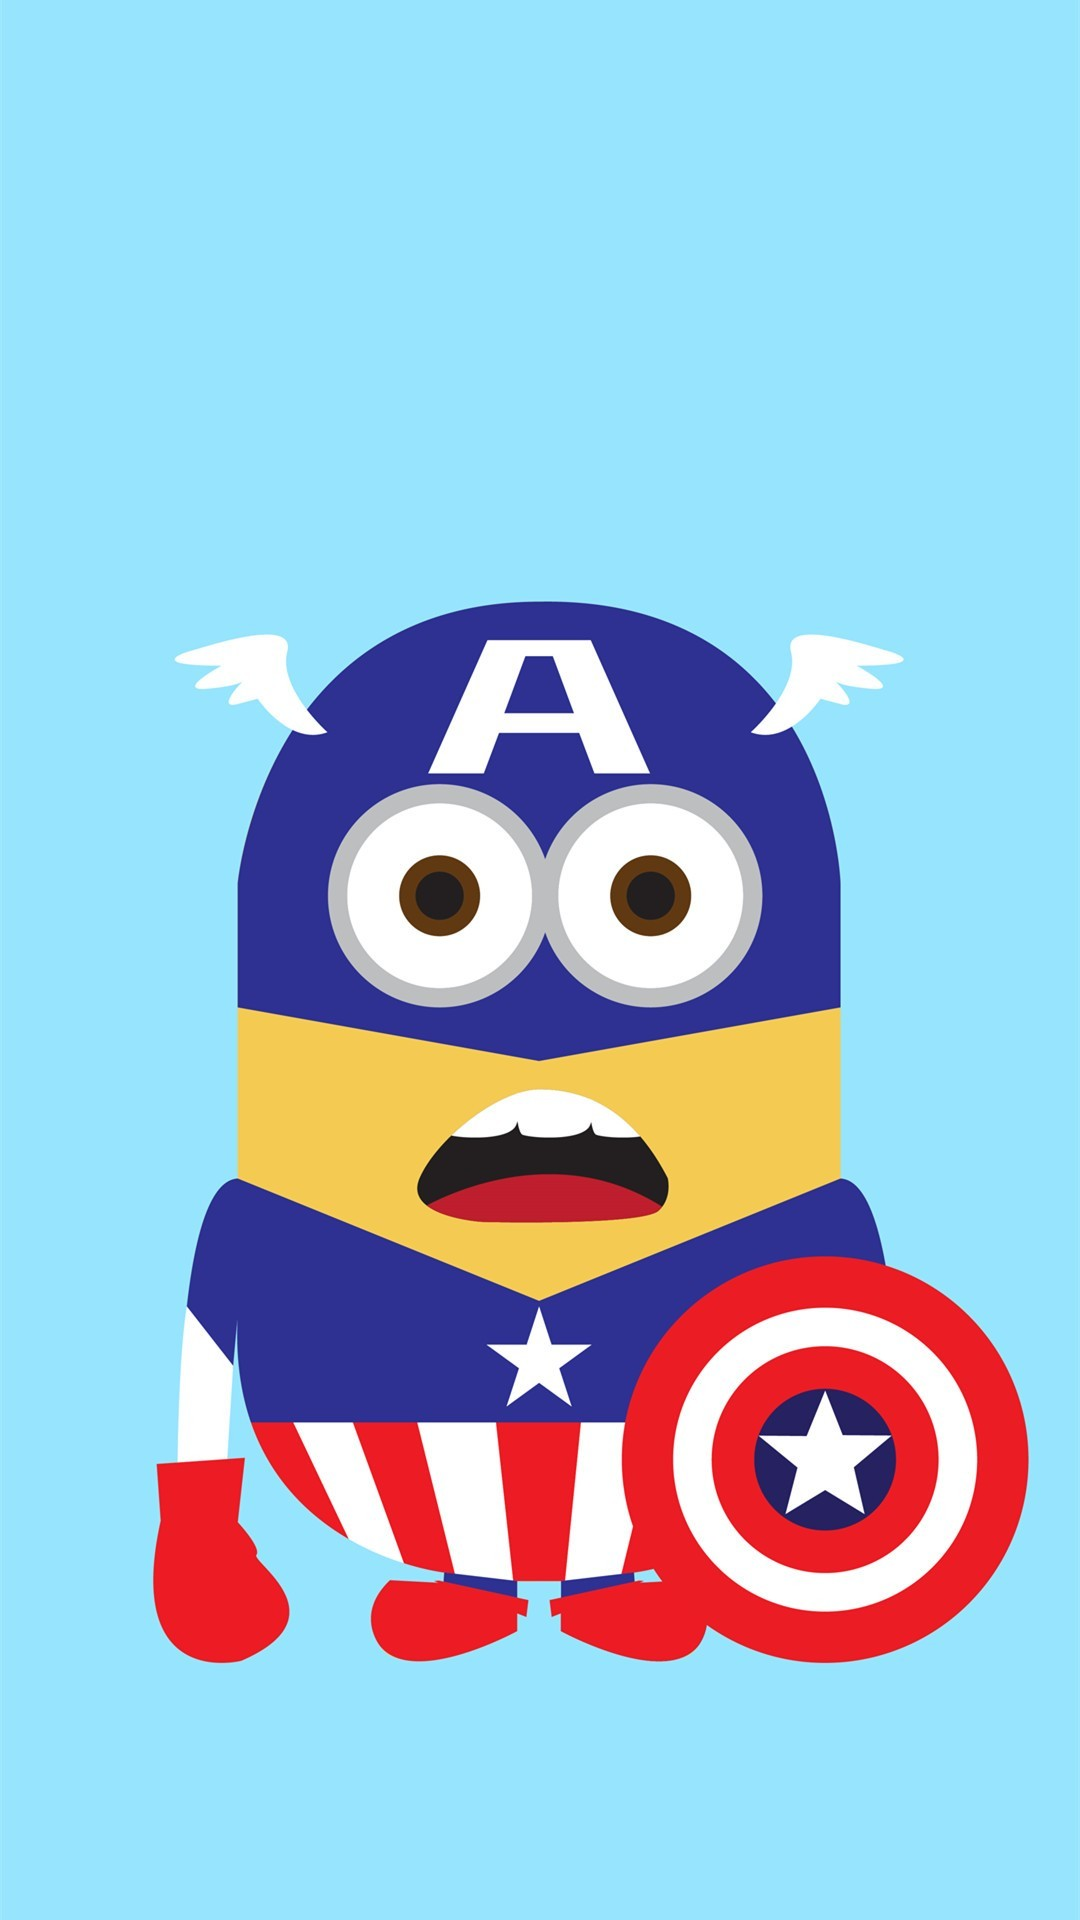 Despicable Me Inspired Captain America Minion Iphone - Minion Captain America - HD Wallpaper